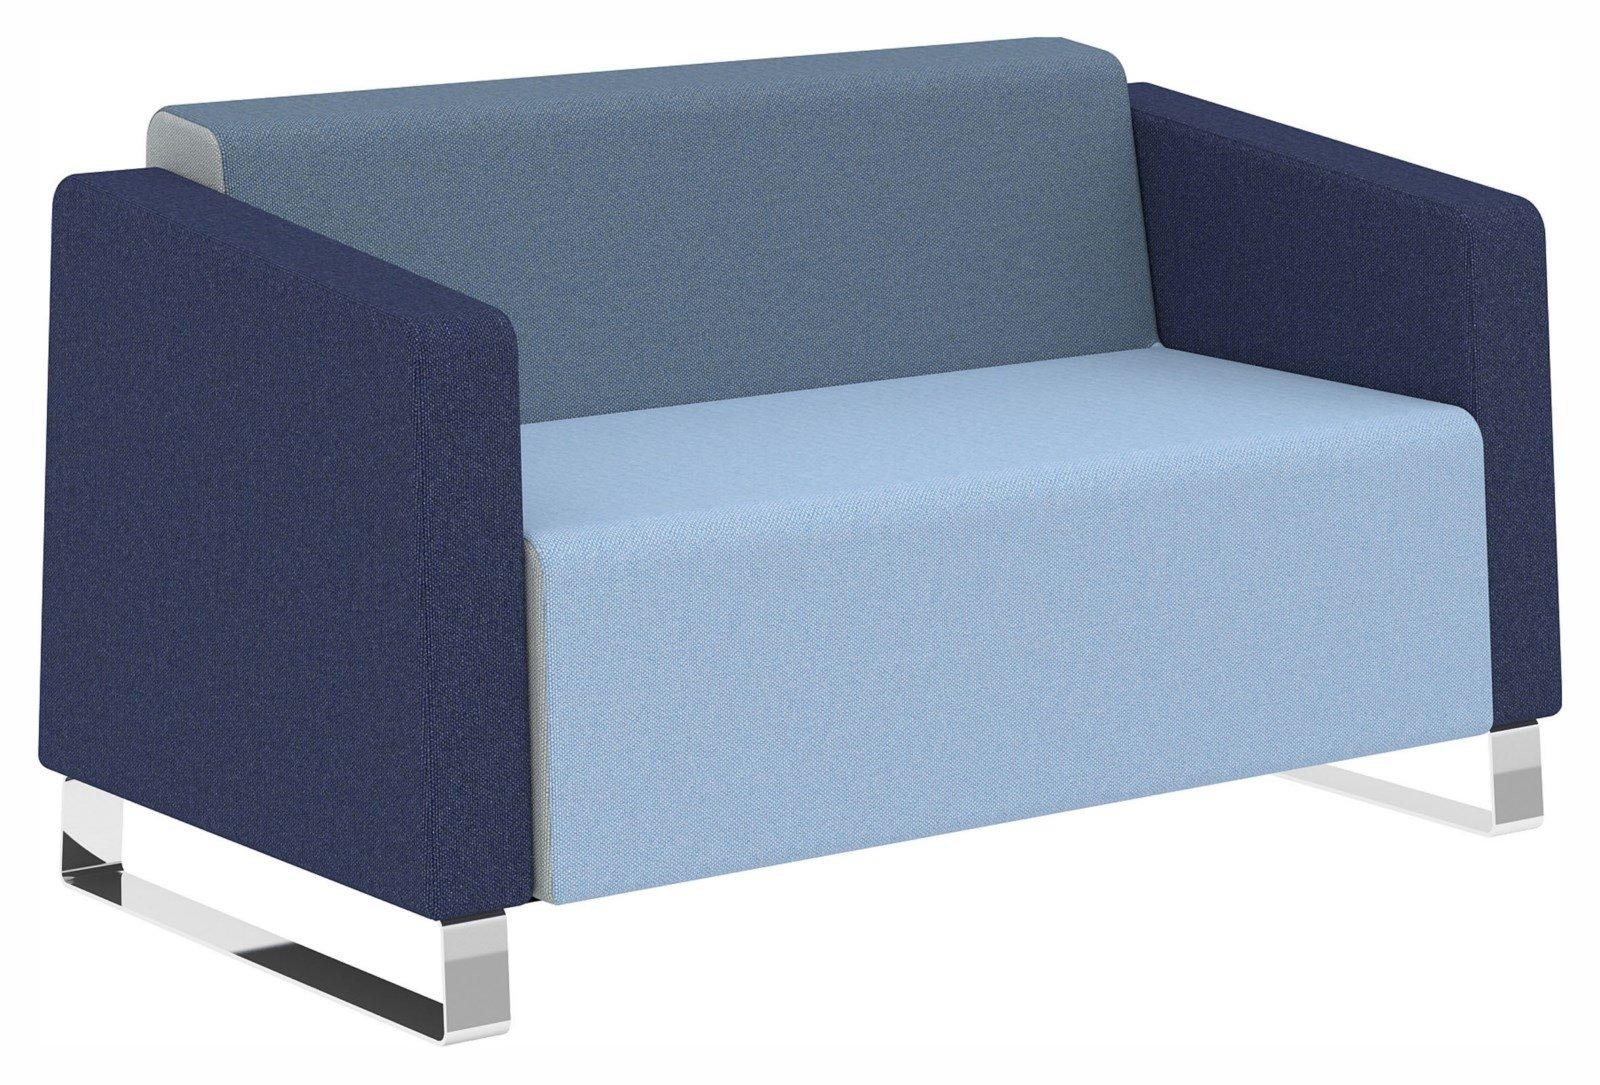 elite ella two seater full back sofa chrome sled leg. Black Bedroom Furniture Sets. Home Design Ideas